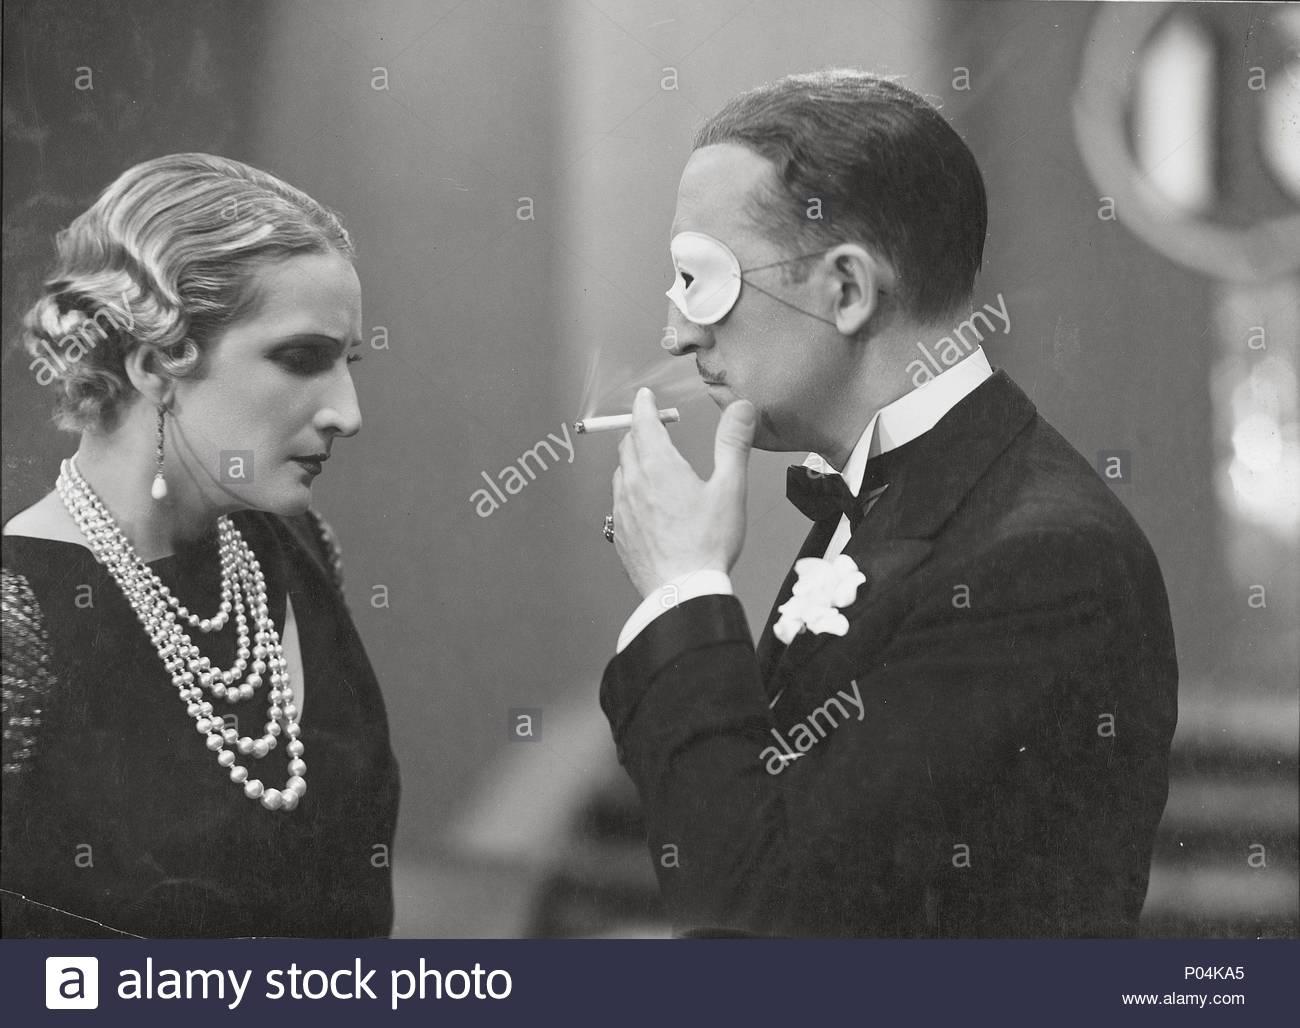 Original Film Title: DOCE HOMBRES Y UNA MUJER.  English Title: TWELVE MEN AND A WOMAN.  Film Director: FERNANDO DELGADO.  Year: 1934.  Stars: MARIANO ASQUERINO; IRENE LOPEZ HEREDIA. Credit: STAR FILMS S.A. / Album - Stock Image